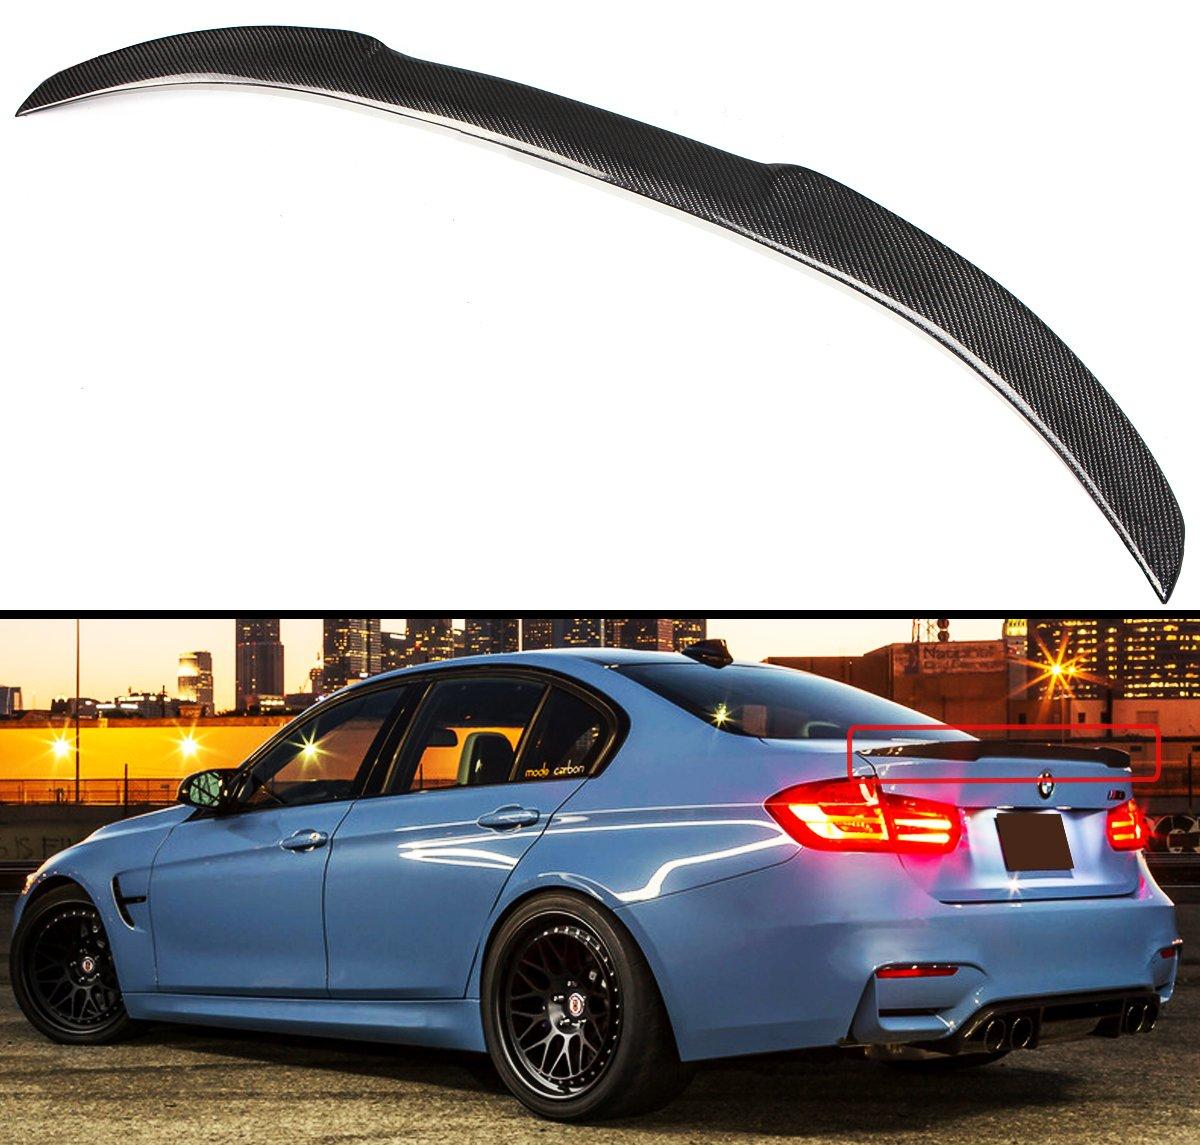 Carbon Fiber Trunk Spoiler Fü r 2013-2018 F30 & F80 M3- Performance Style M4 Look Cuztom Tuning